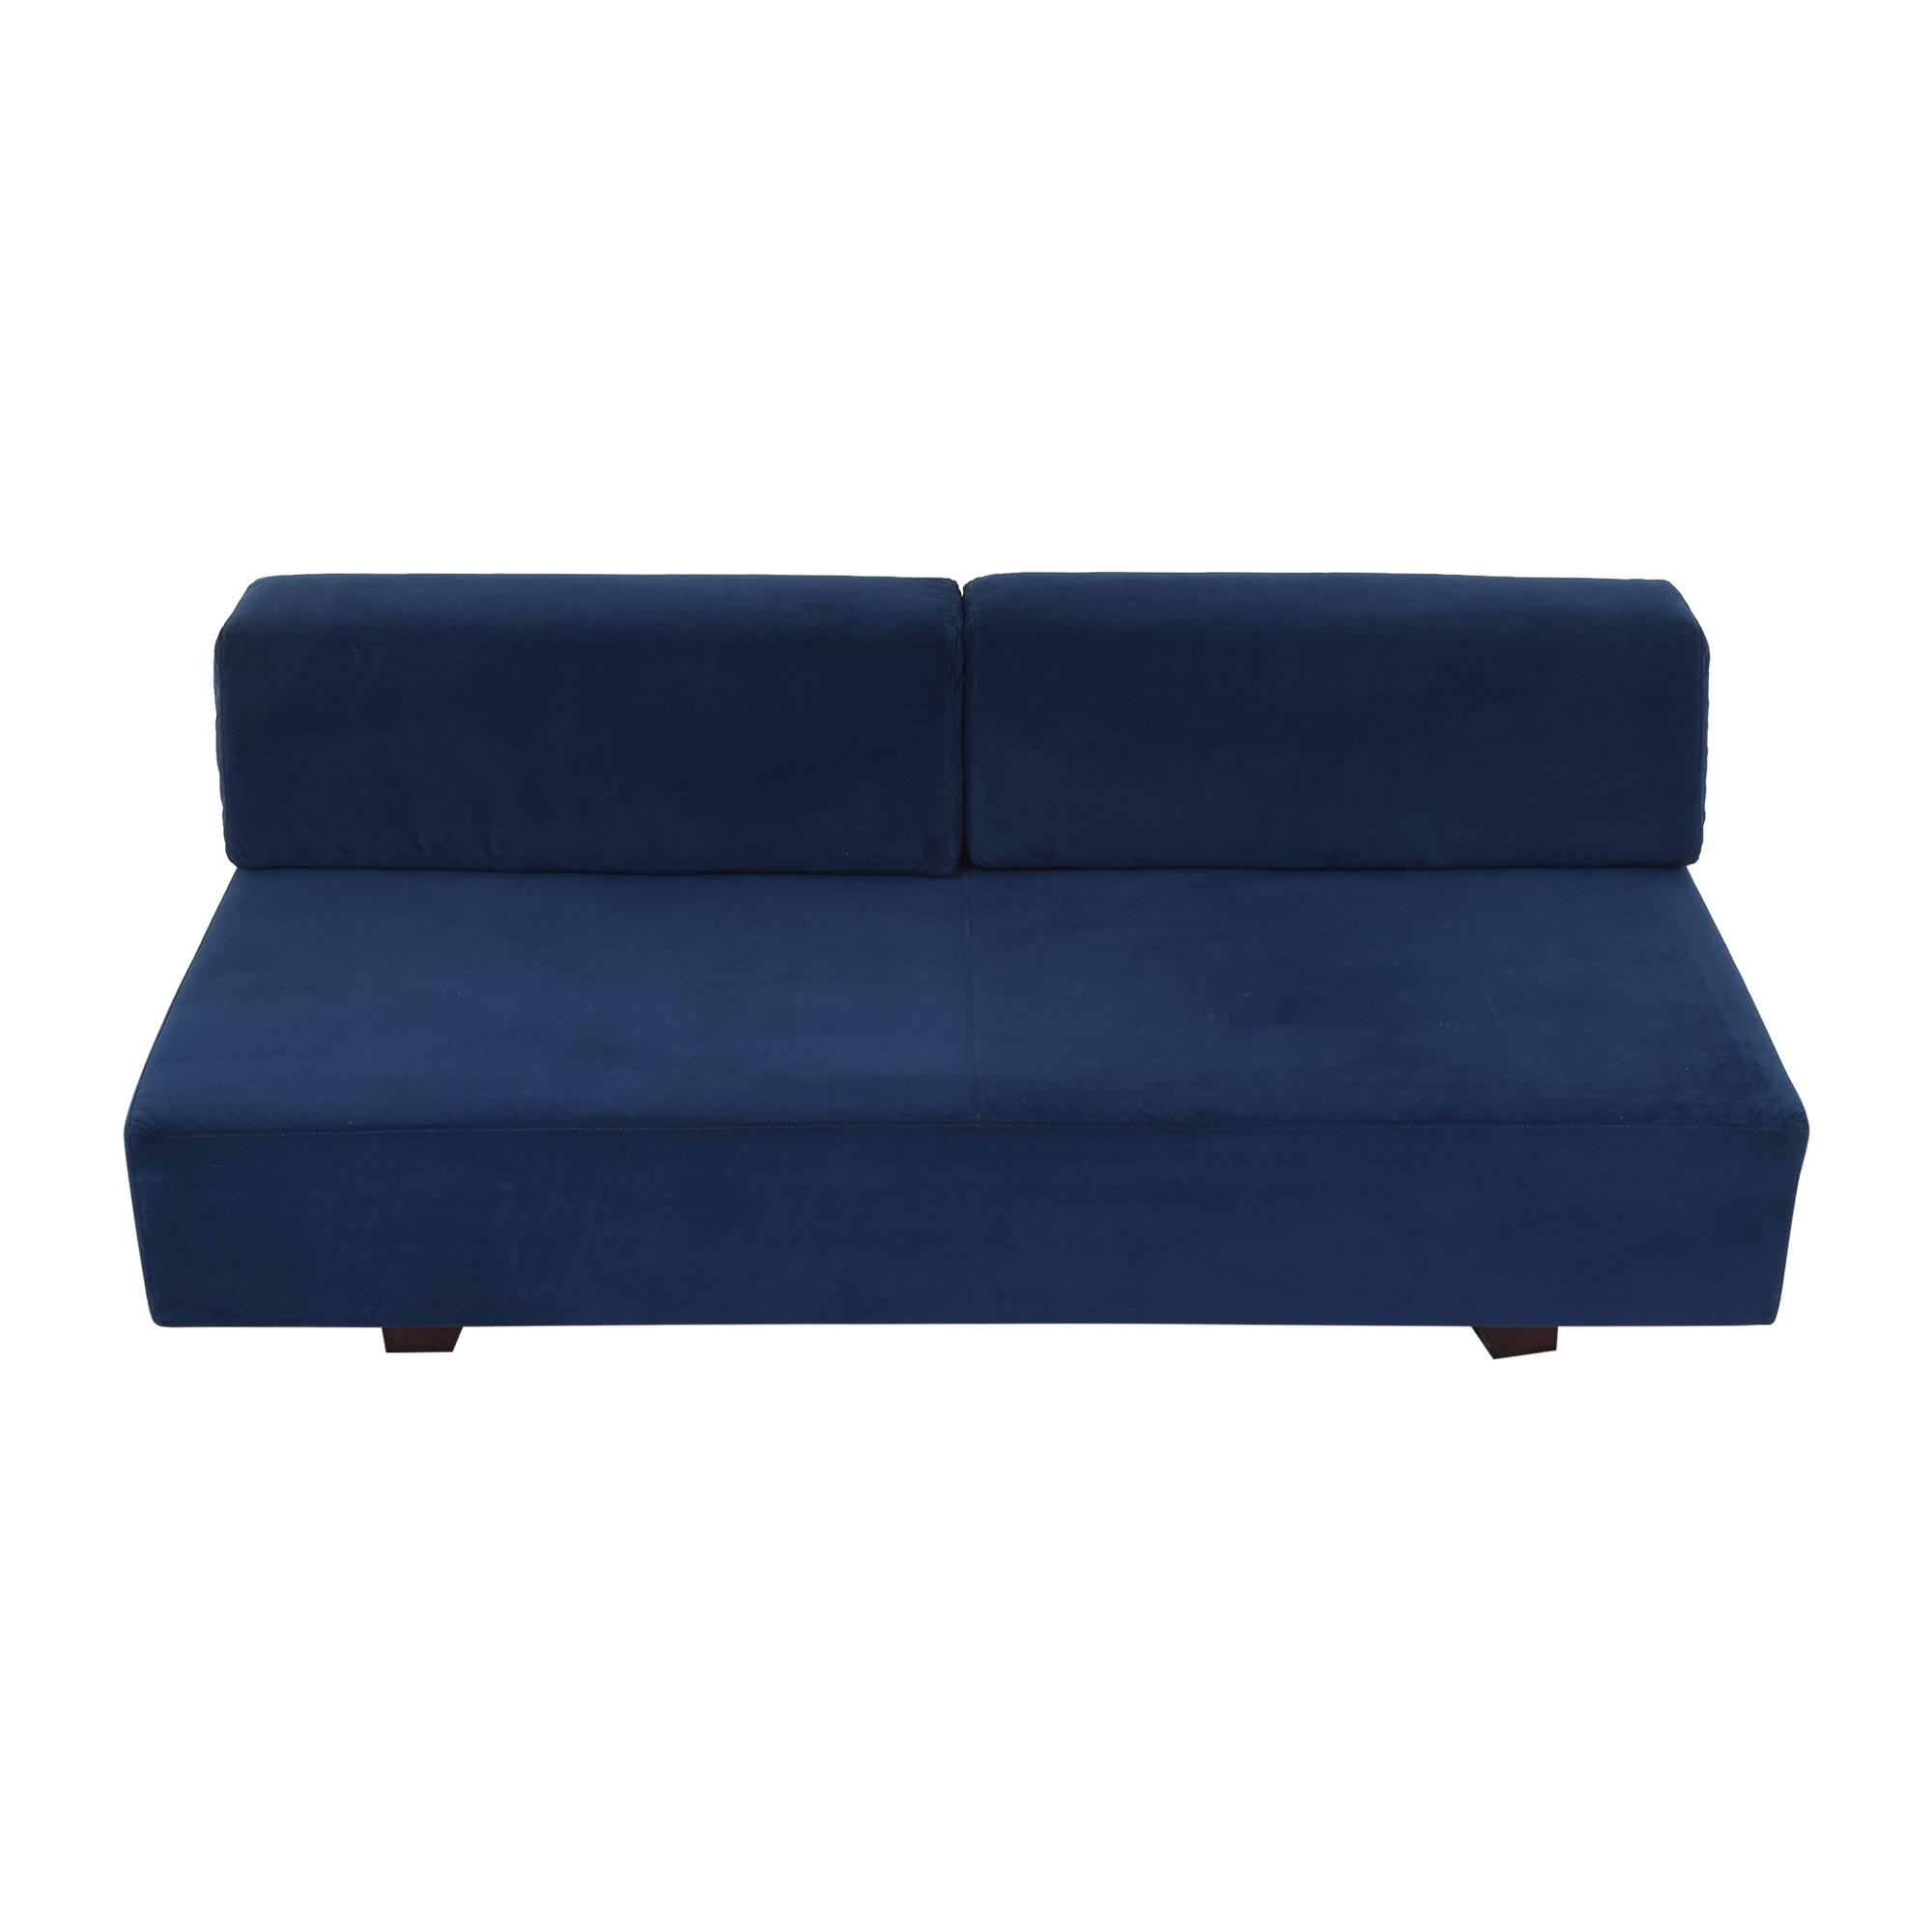 West Elm Tillary Sofa / Classic Sofas